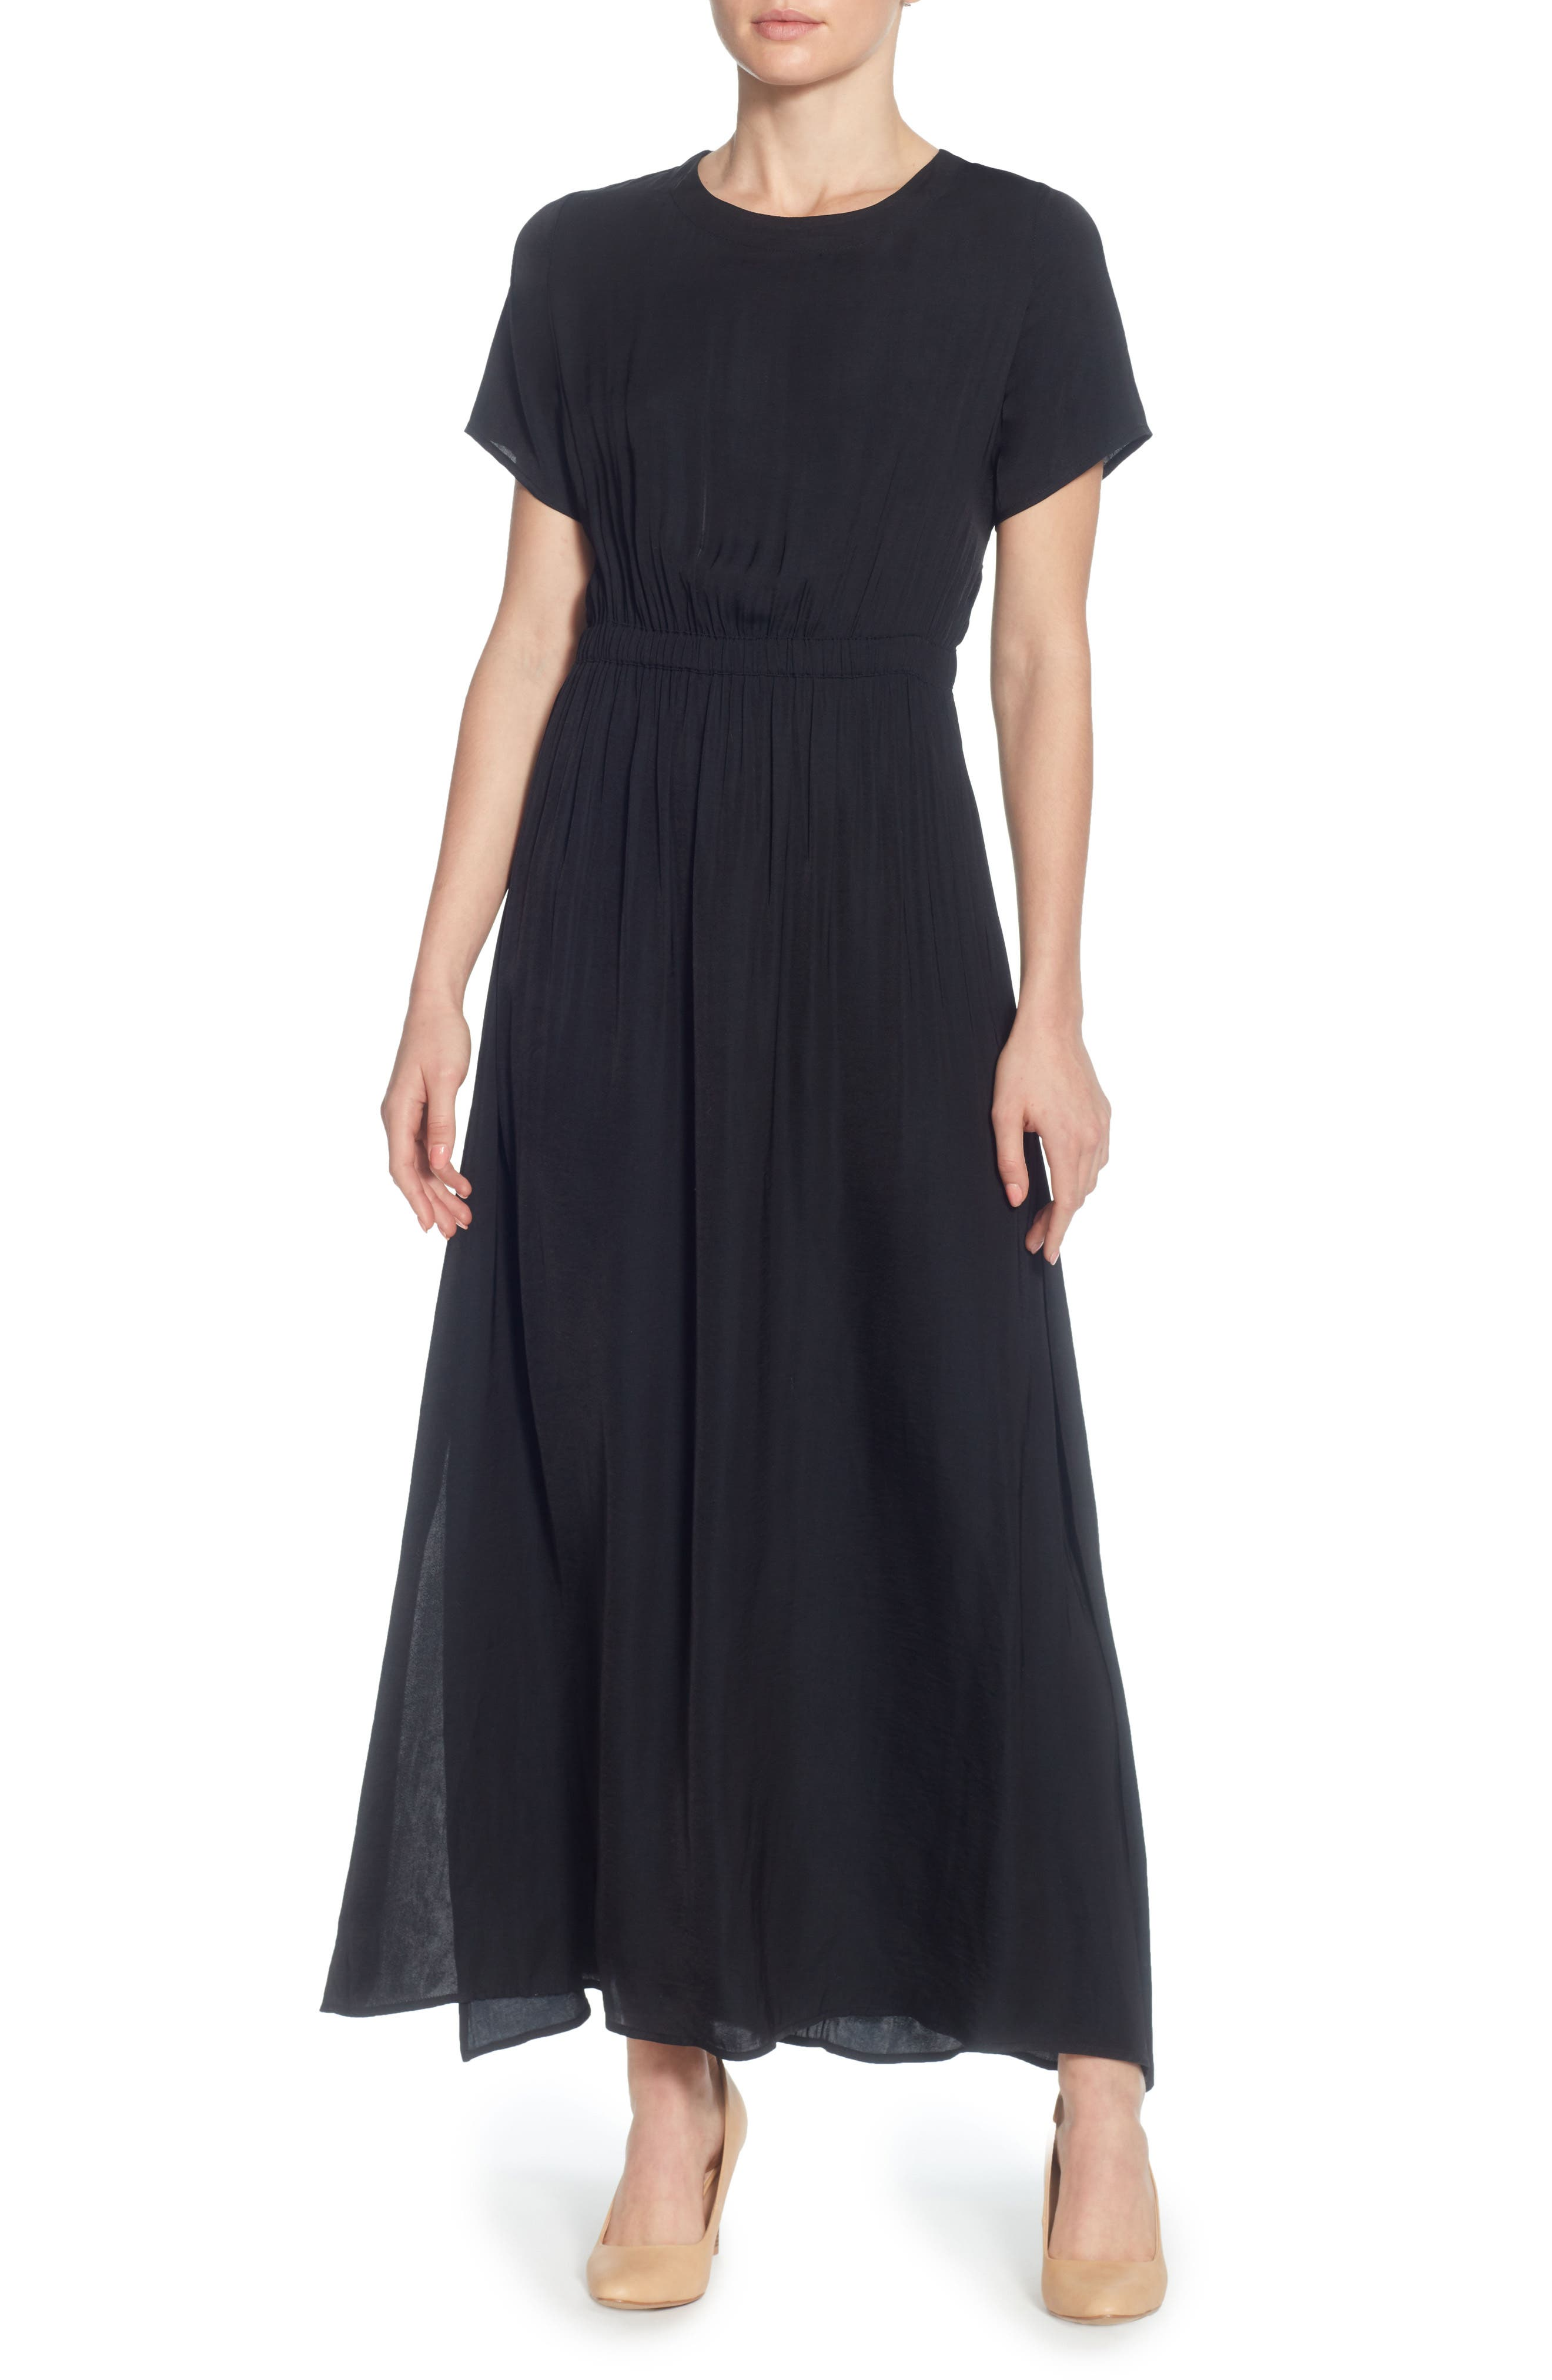 Lua Maxi Dress,                         Main,                         color, Black